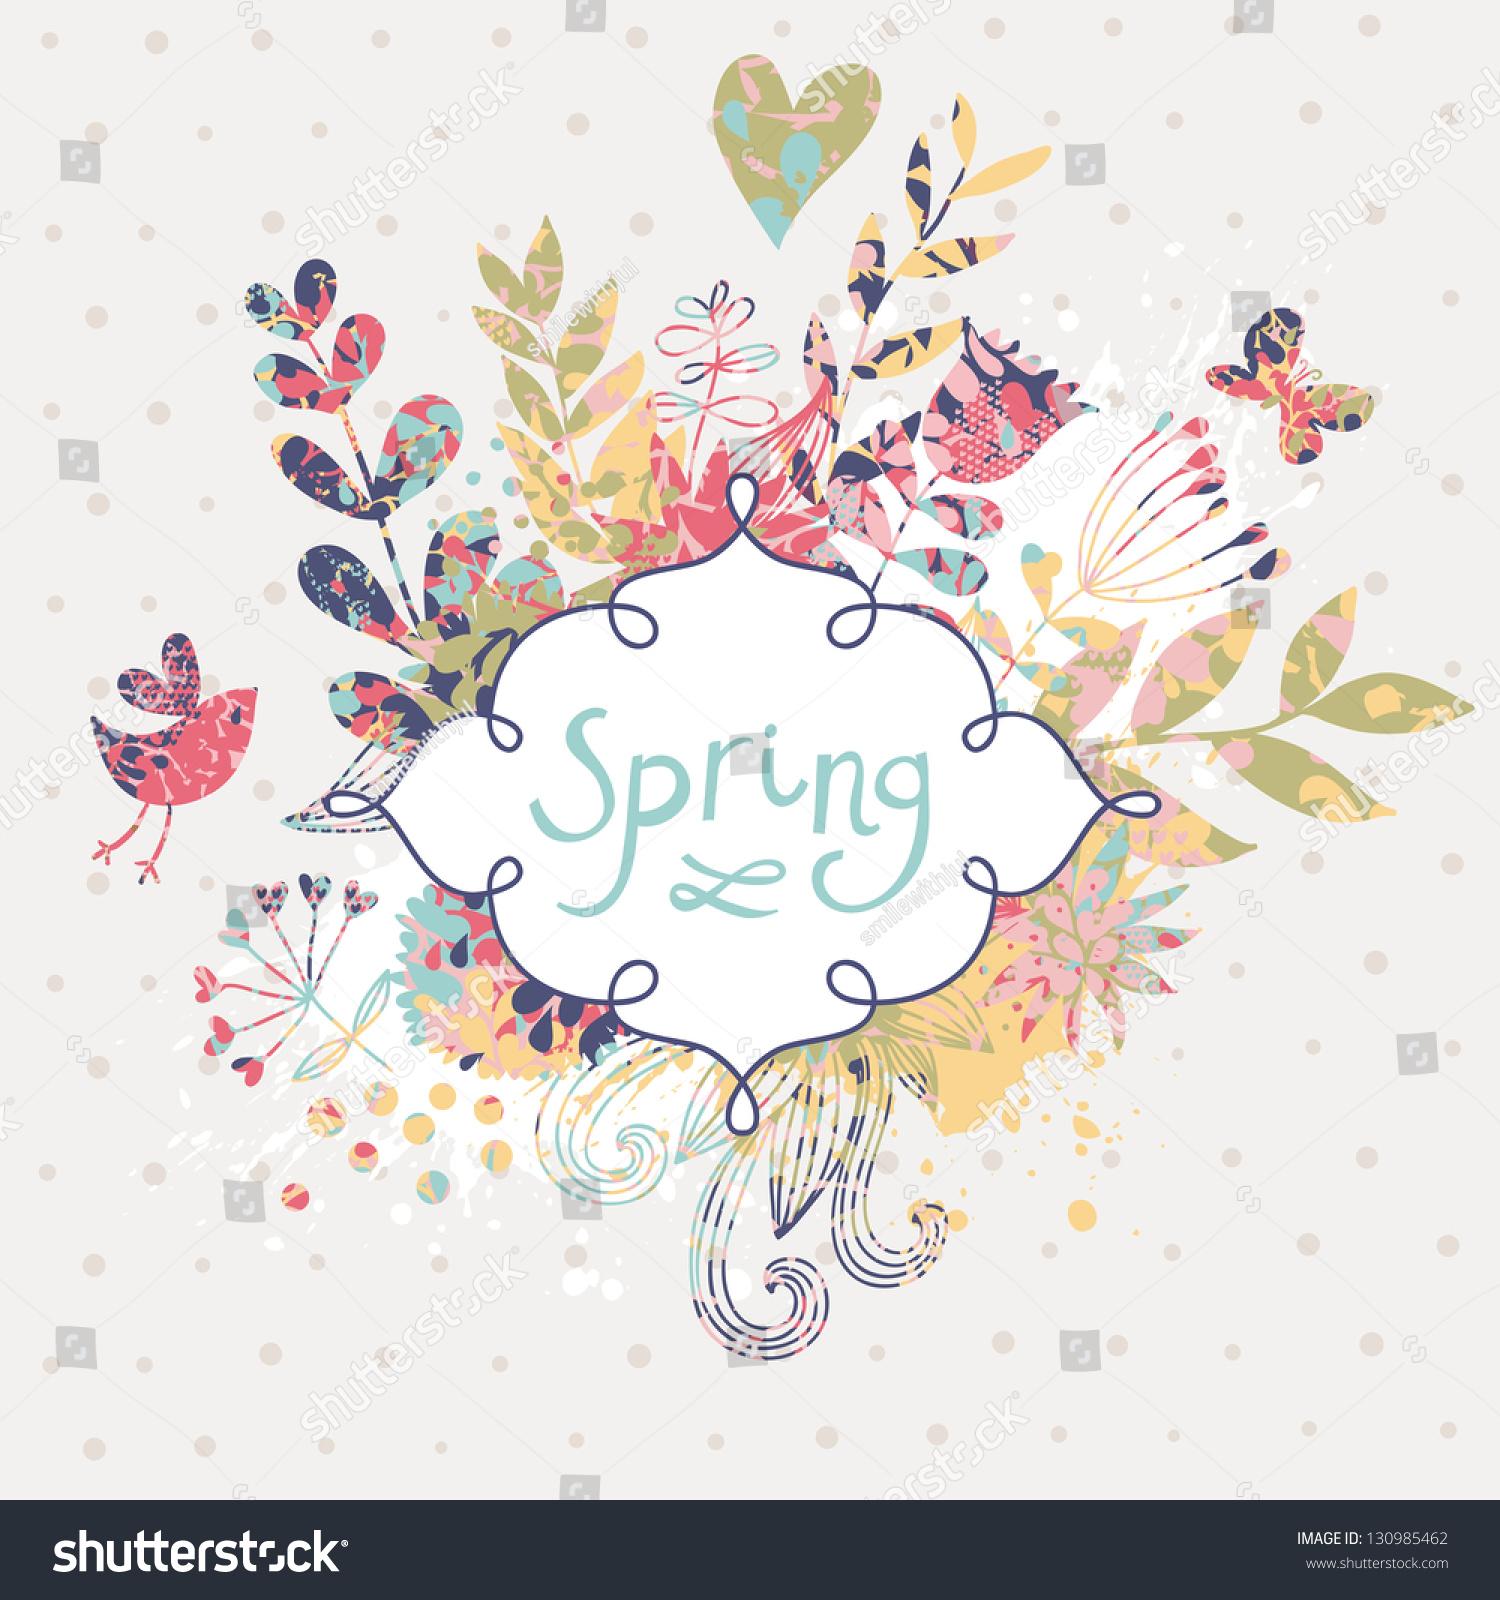 Spring Floral Design Element Birds Flowers Stock Vector 130985462 - Shutterstock